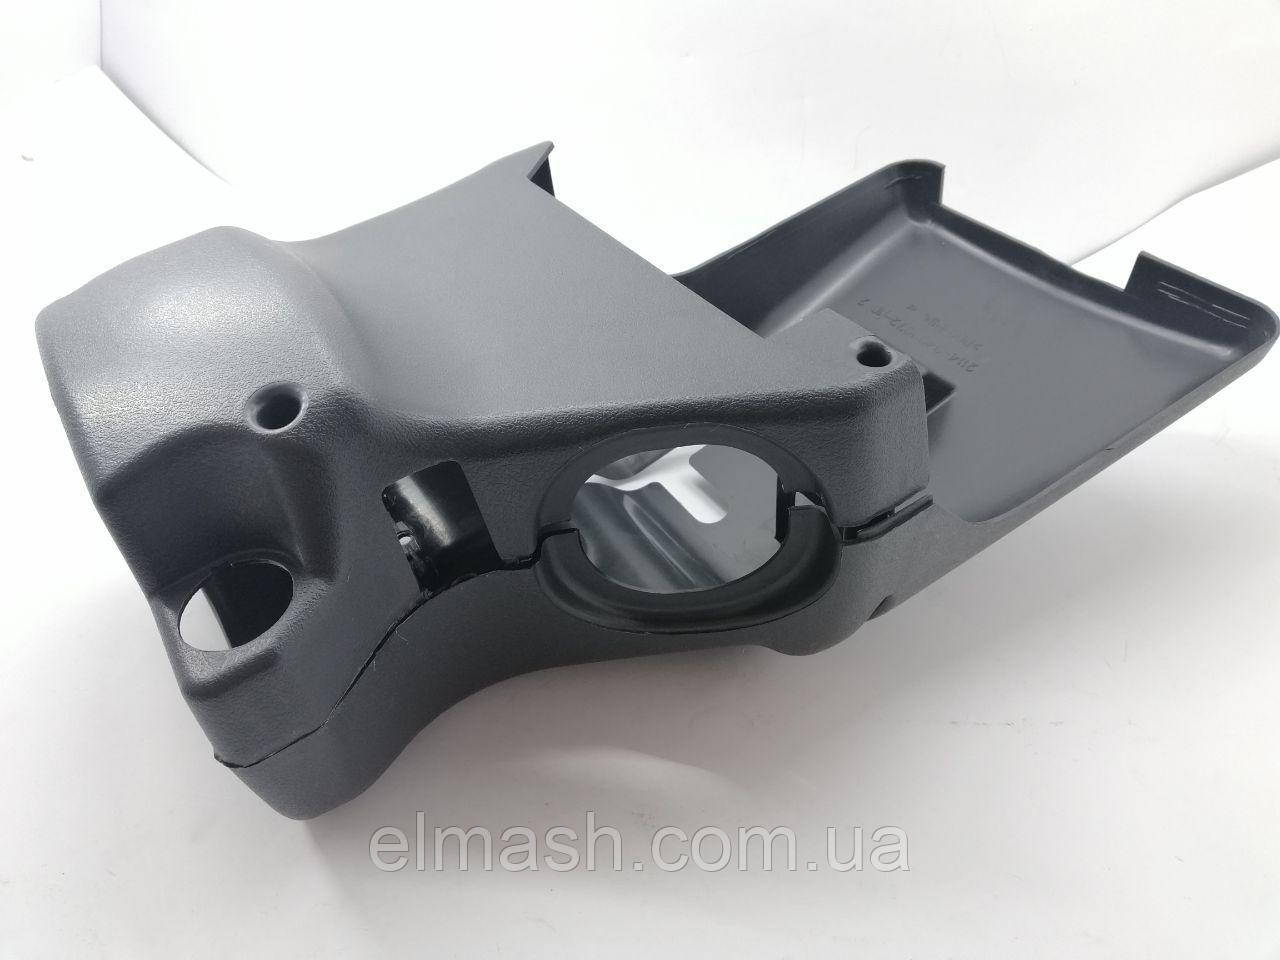 Кожух рулевого механизма ВАЗ 2114 комплект (пр-во Россия)